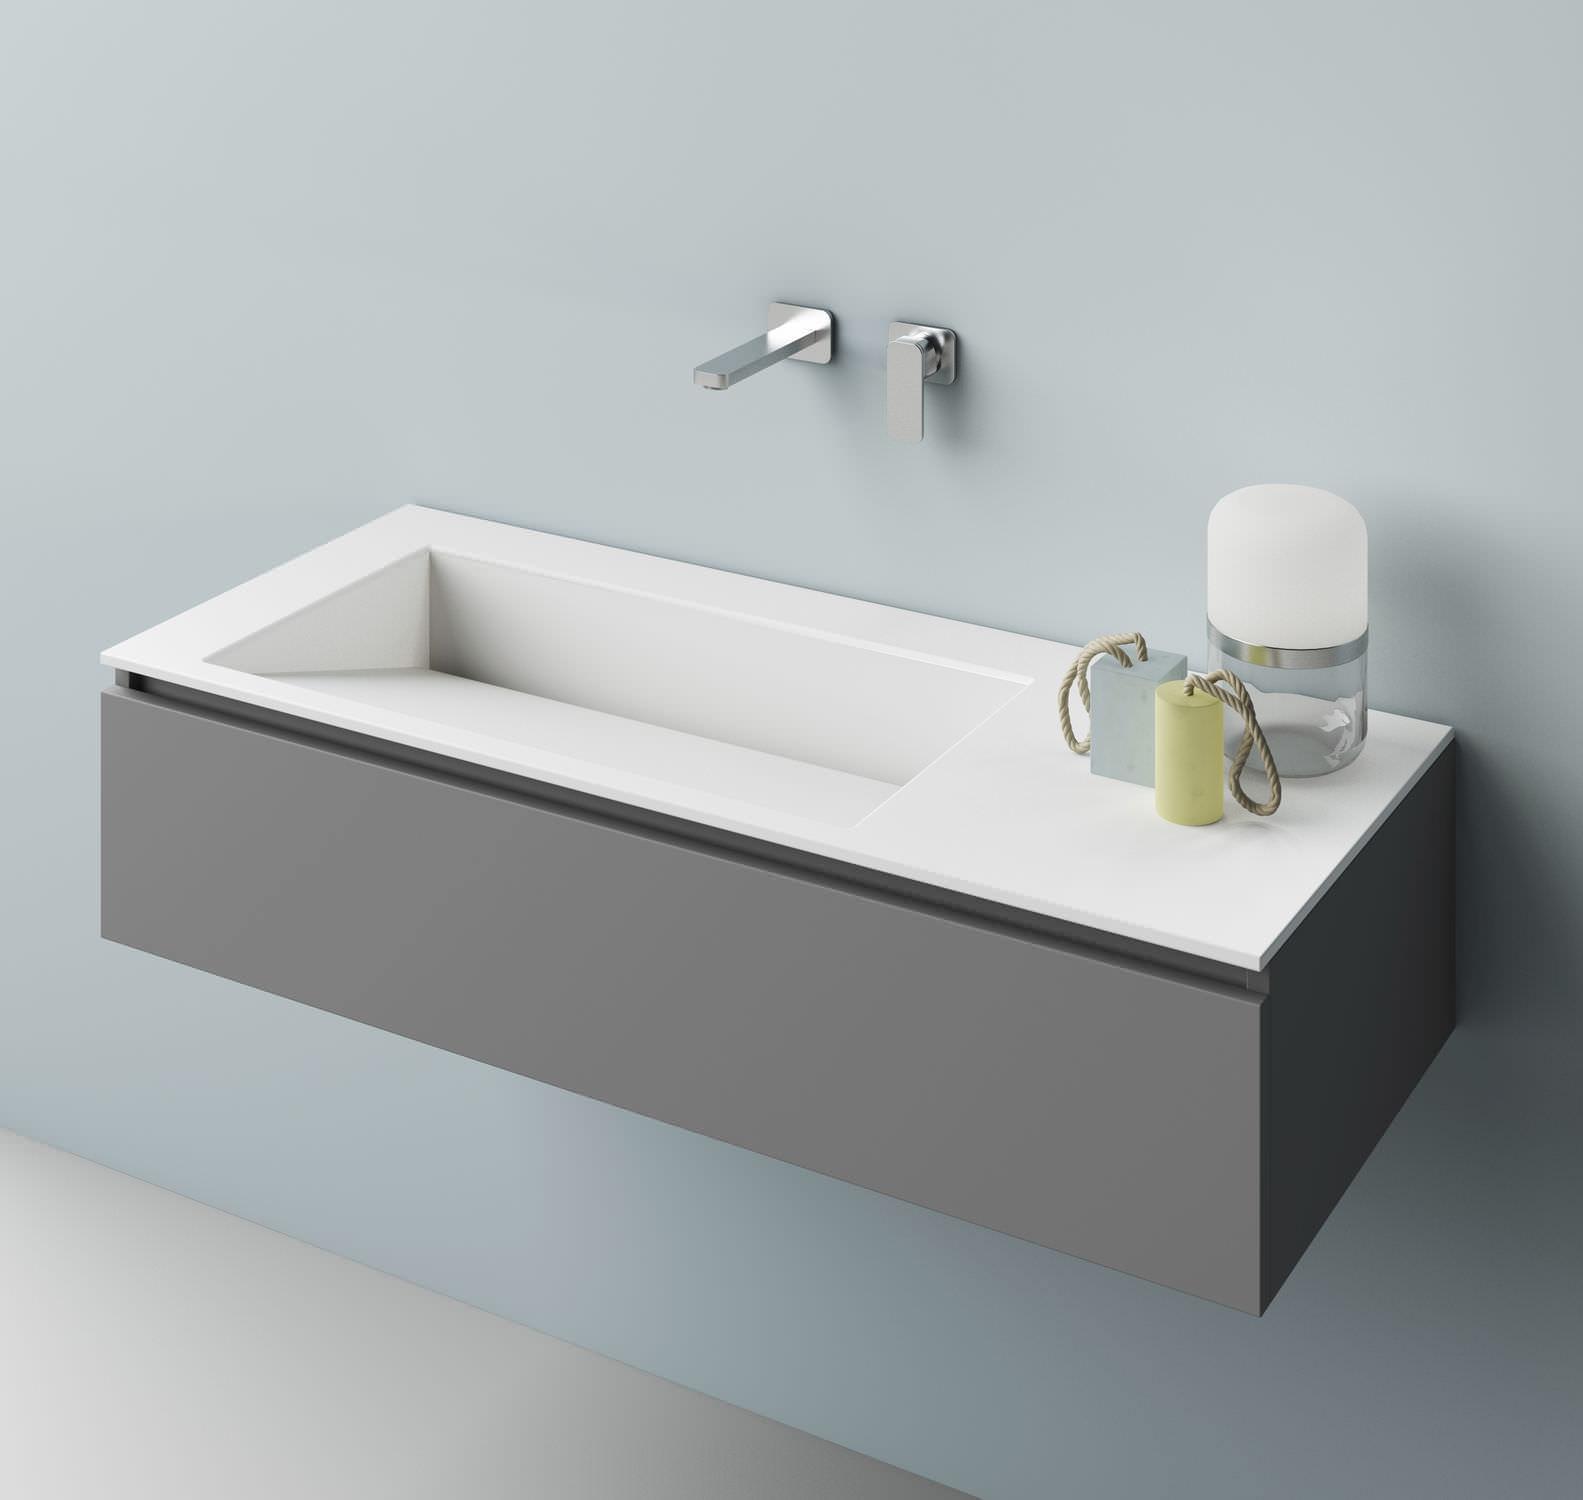 Aufsatzwaschbecken / rechteckig / aus Corian® / modern - FAUST ... | {Waschbecken rechteckig 6}